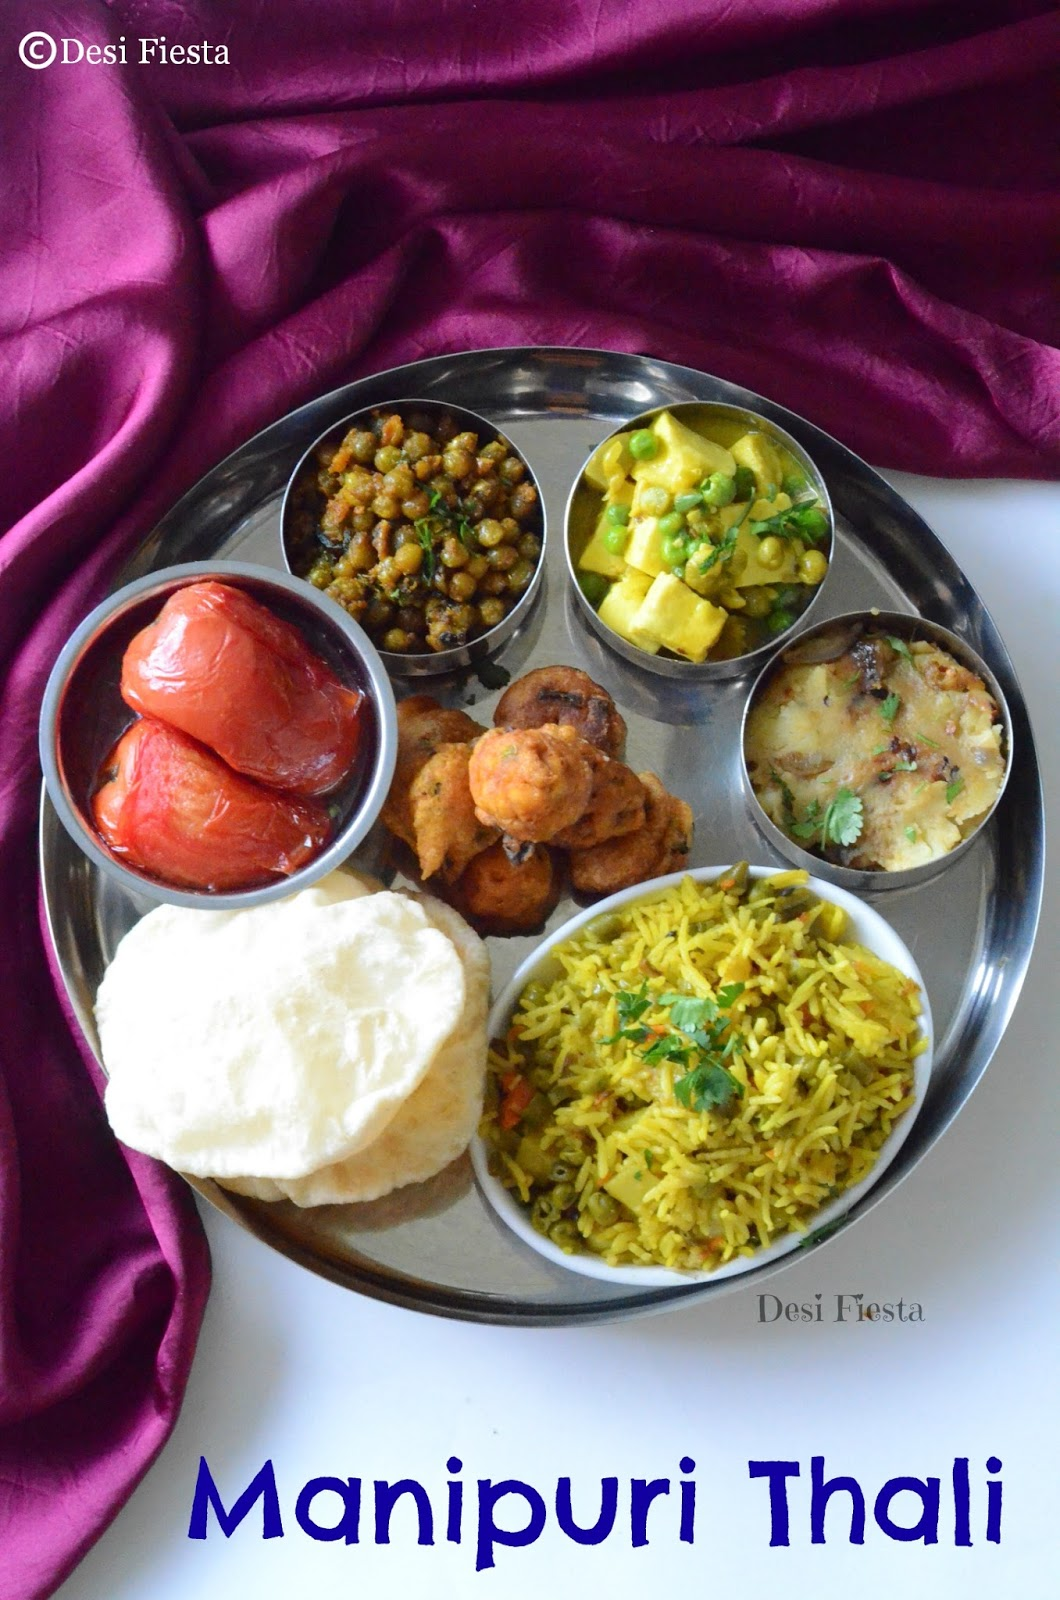 Manipuri thali manipur cuisine desi fiesta manipuri recipes forumfinder Image collections